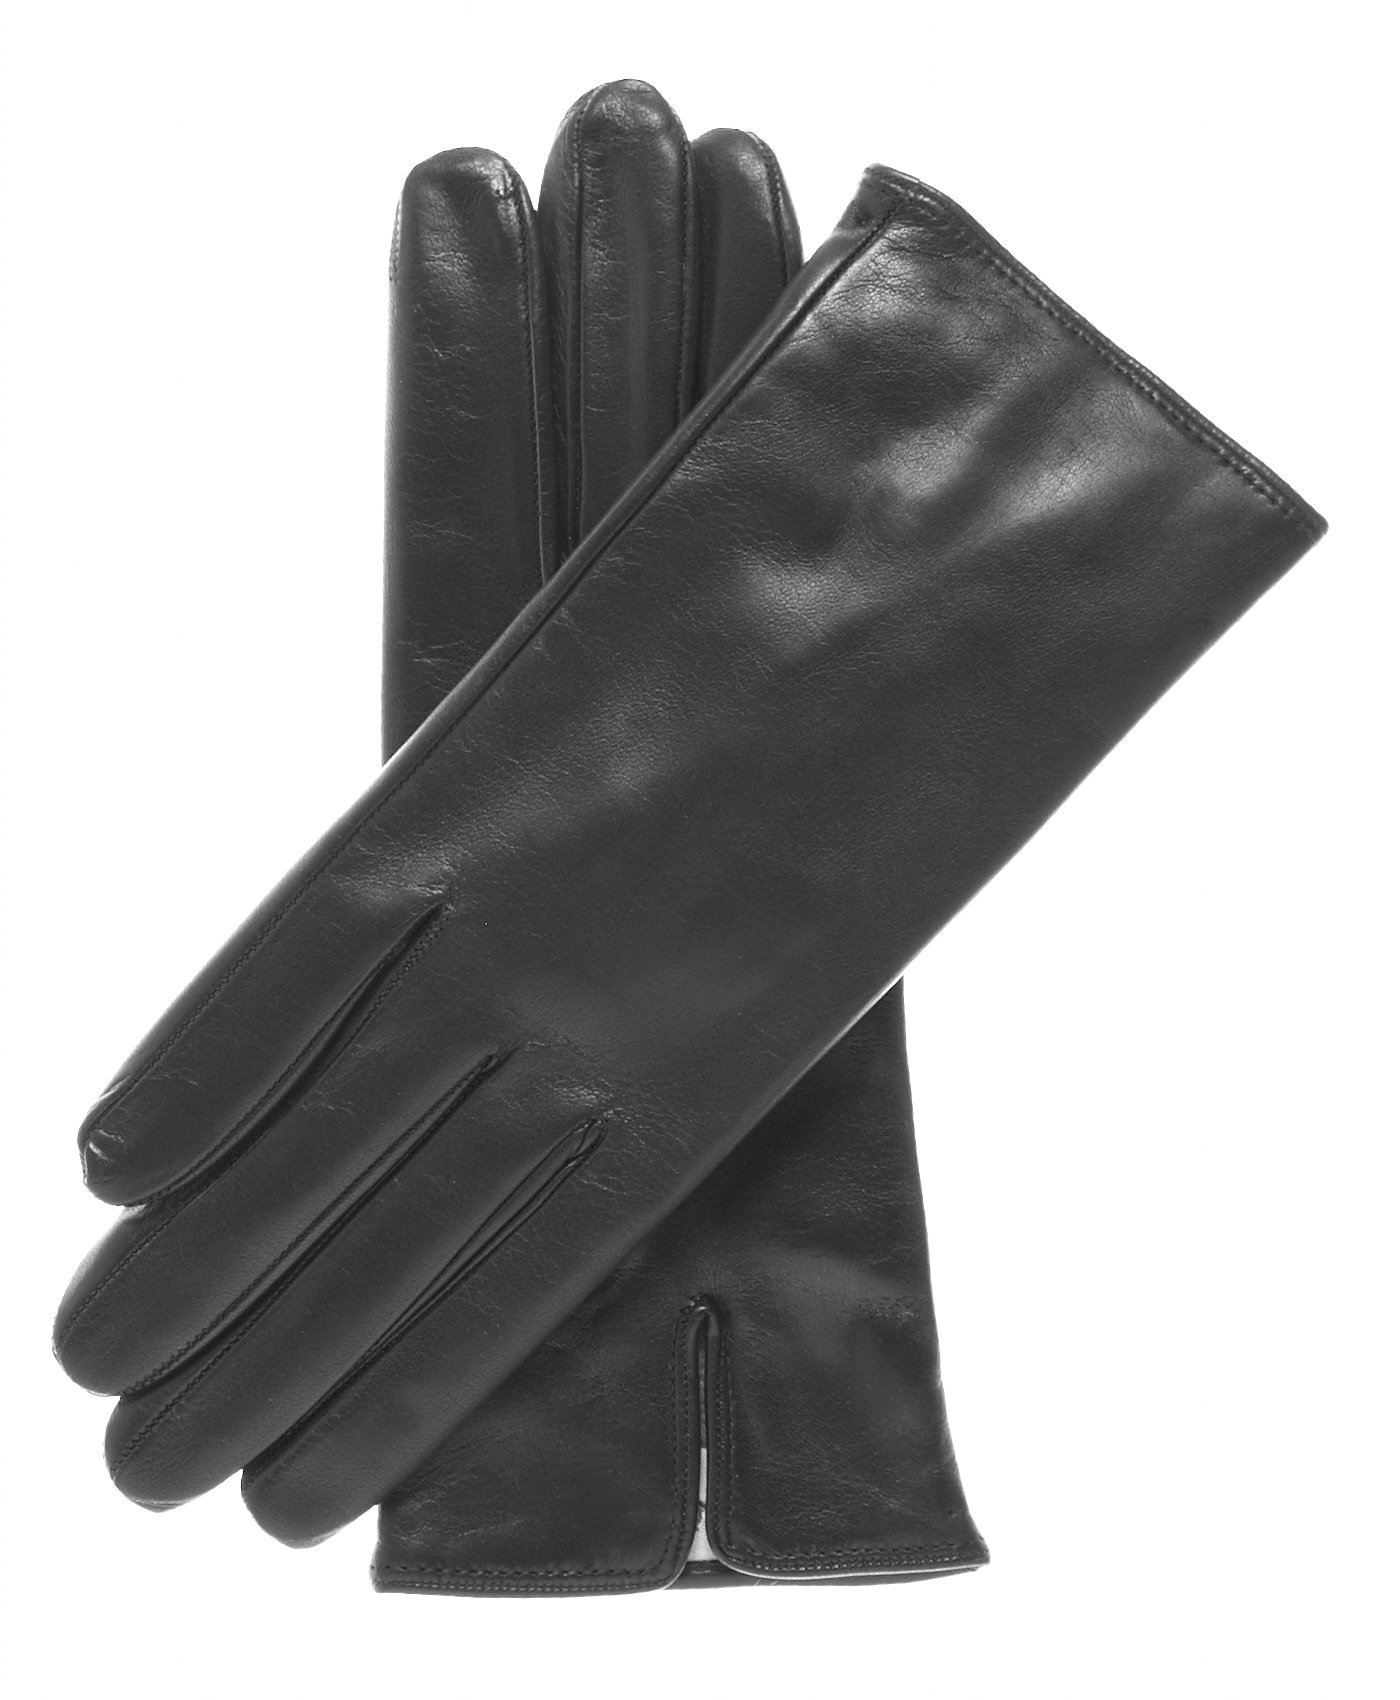 Fratelli Orsini Women's Italian Cashmere Lined Leather Gloves Size 7 1/2 Color Black